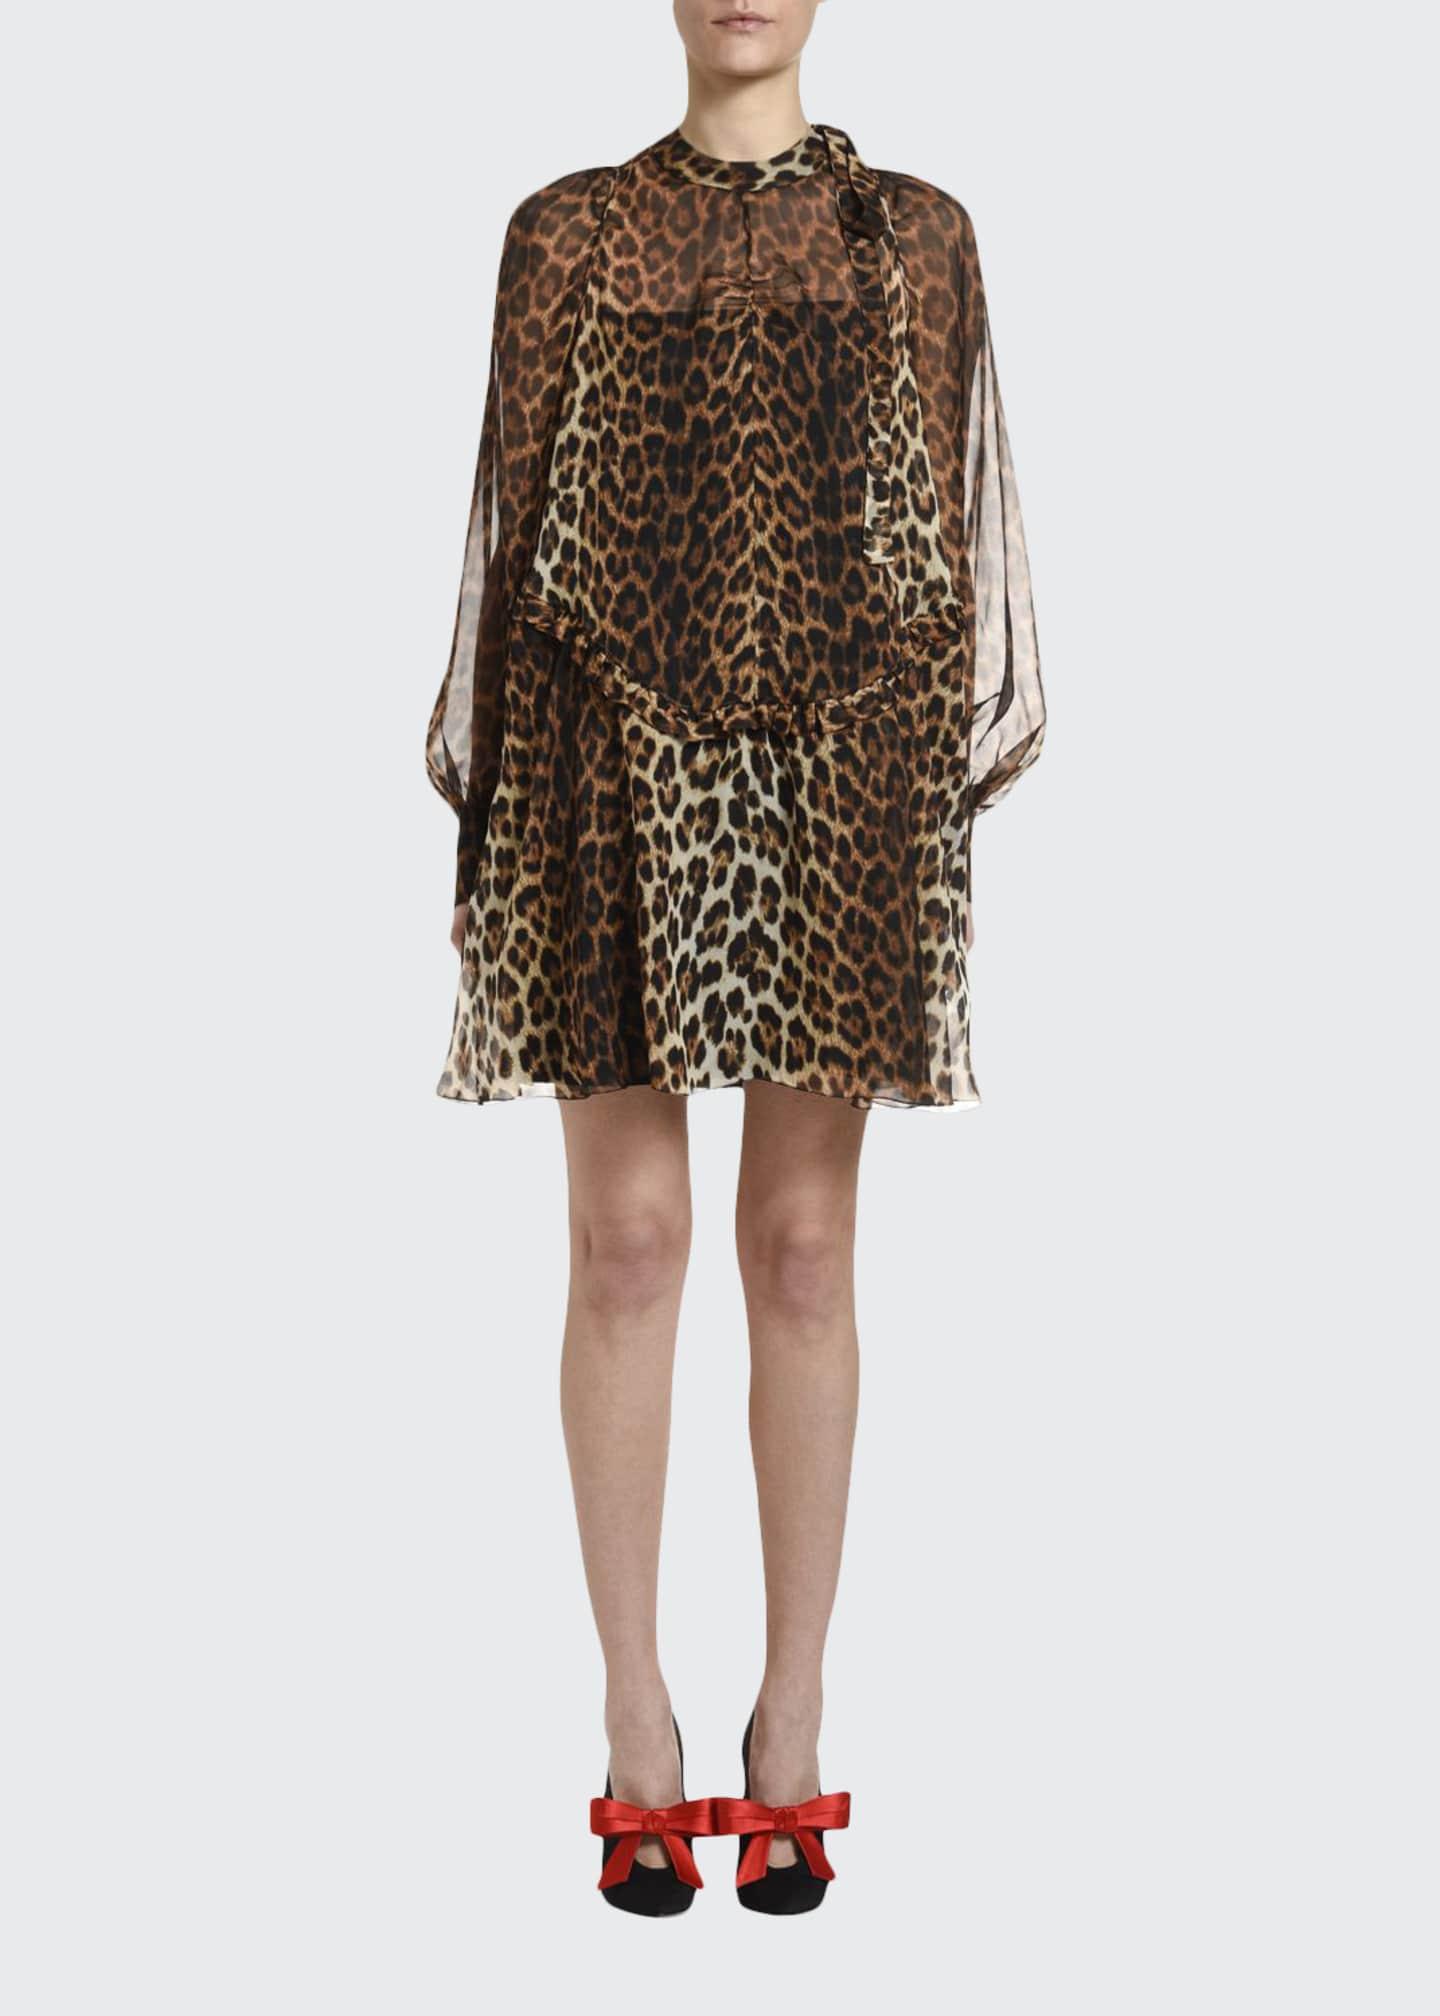 No. 21 Leopard Tie-Neck Blouson-Sleeve Keyhole Mini Silk